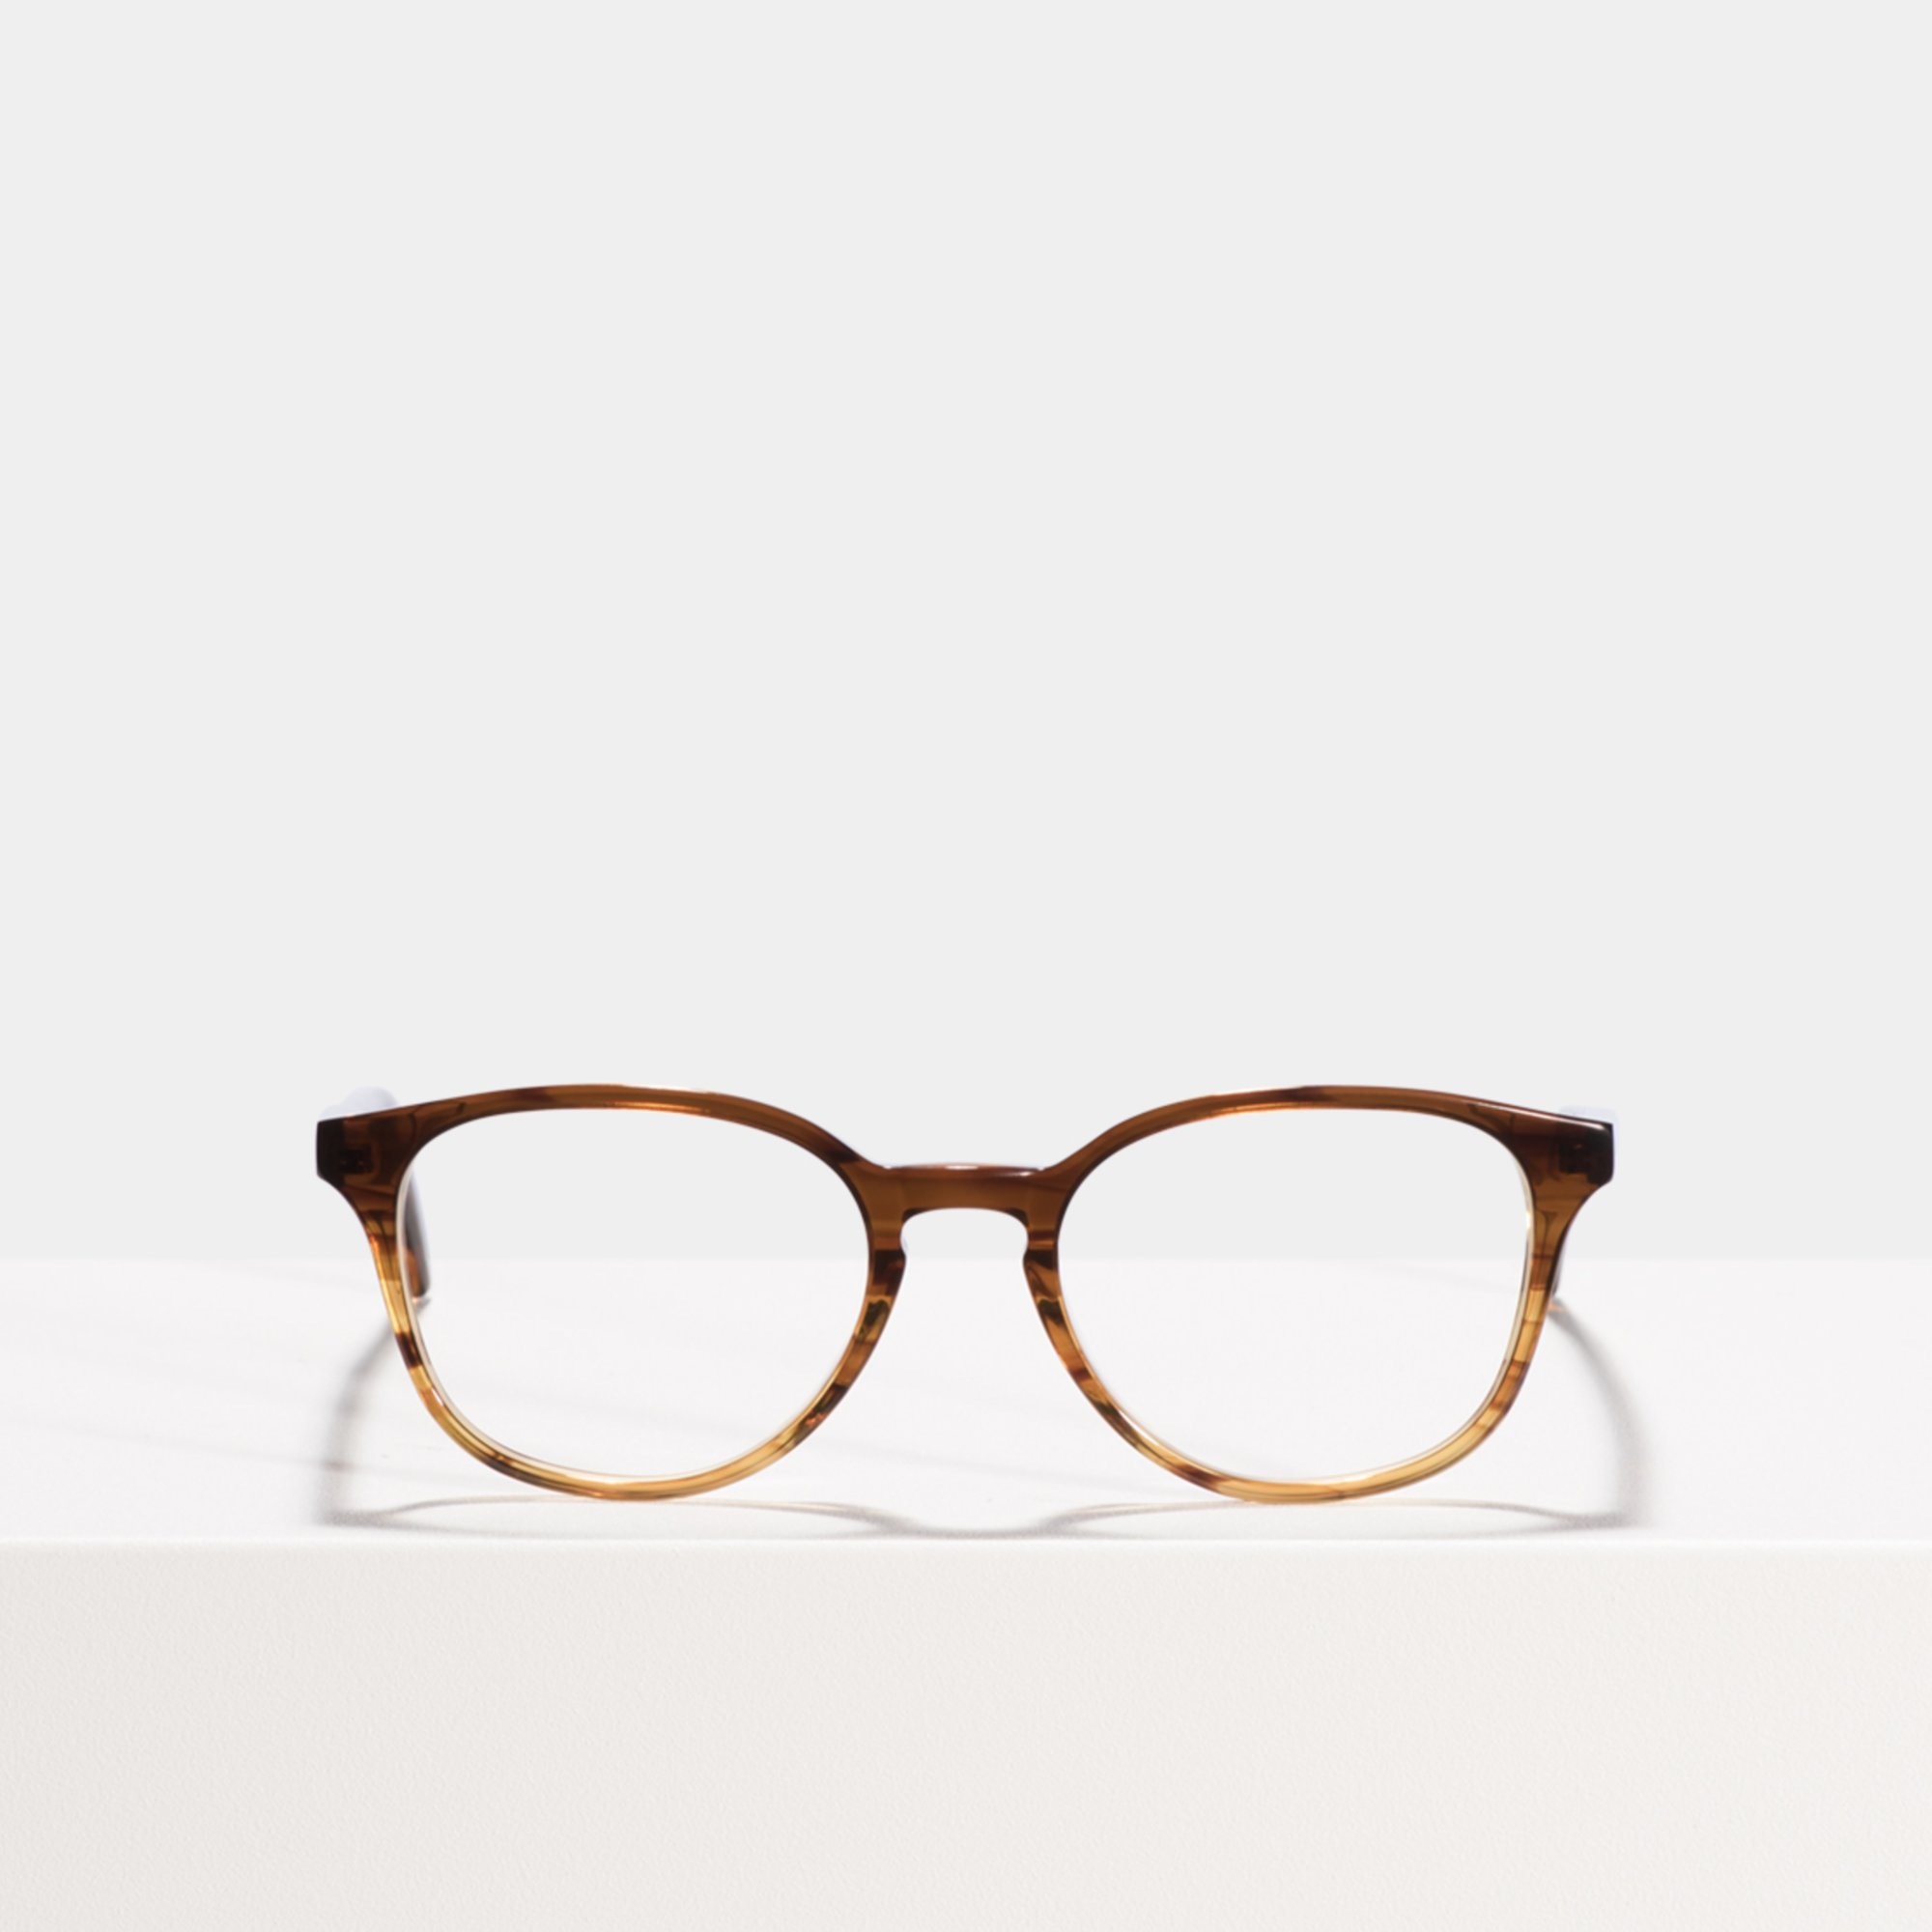 Ace & Tate Glasses    acetate in Brown, Orange